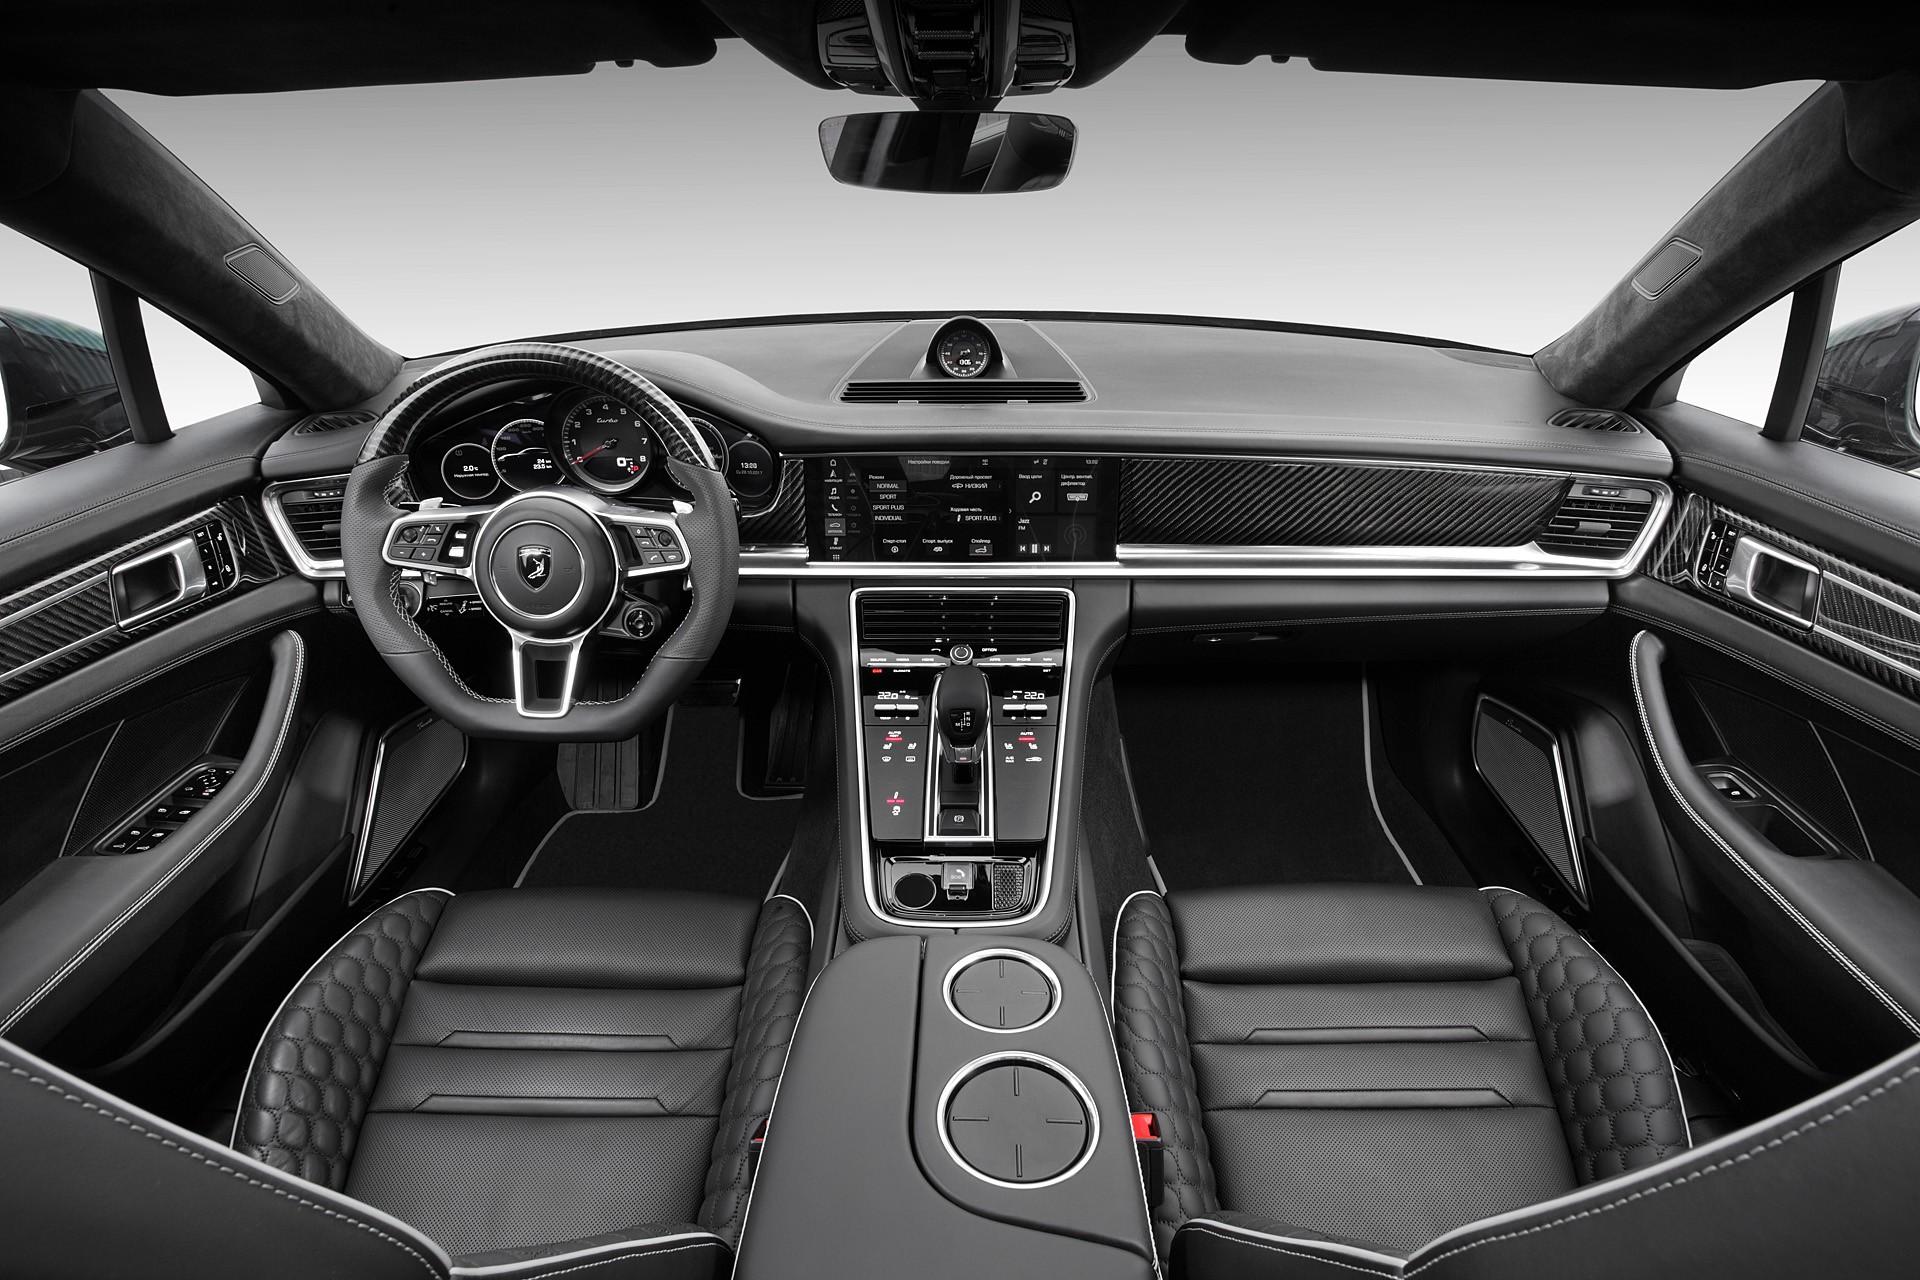 Porsche Panamera 971 INTERIOR